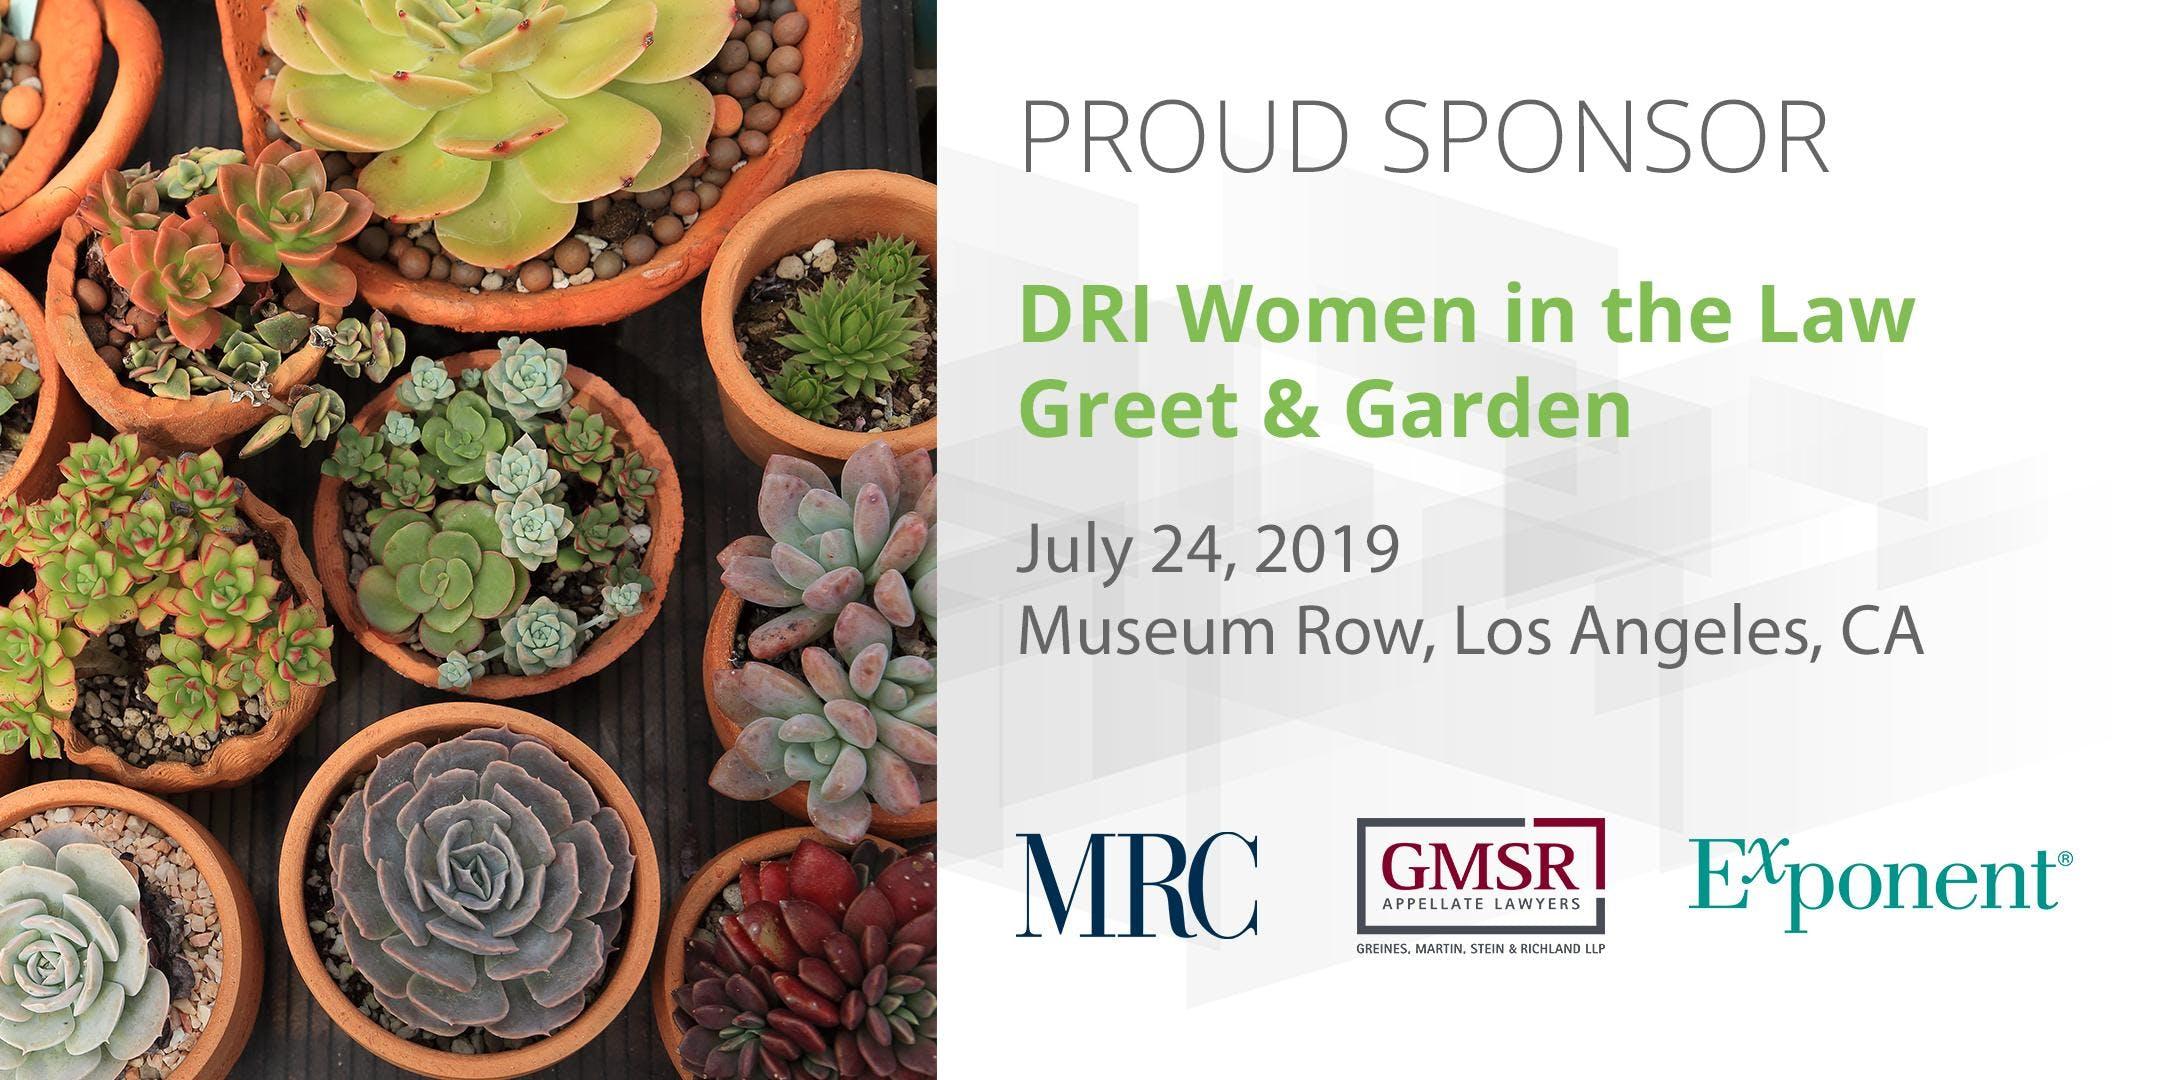 DRI Women in the Law Greet & Garden Event -  7/24/19 Los Angeles, CA